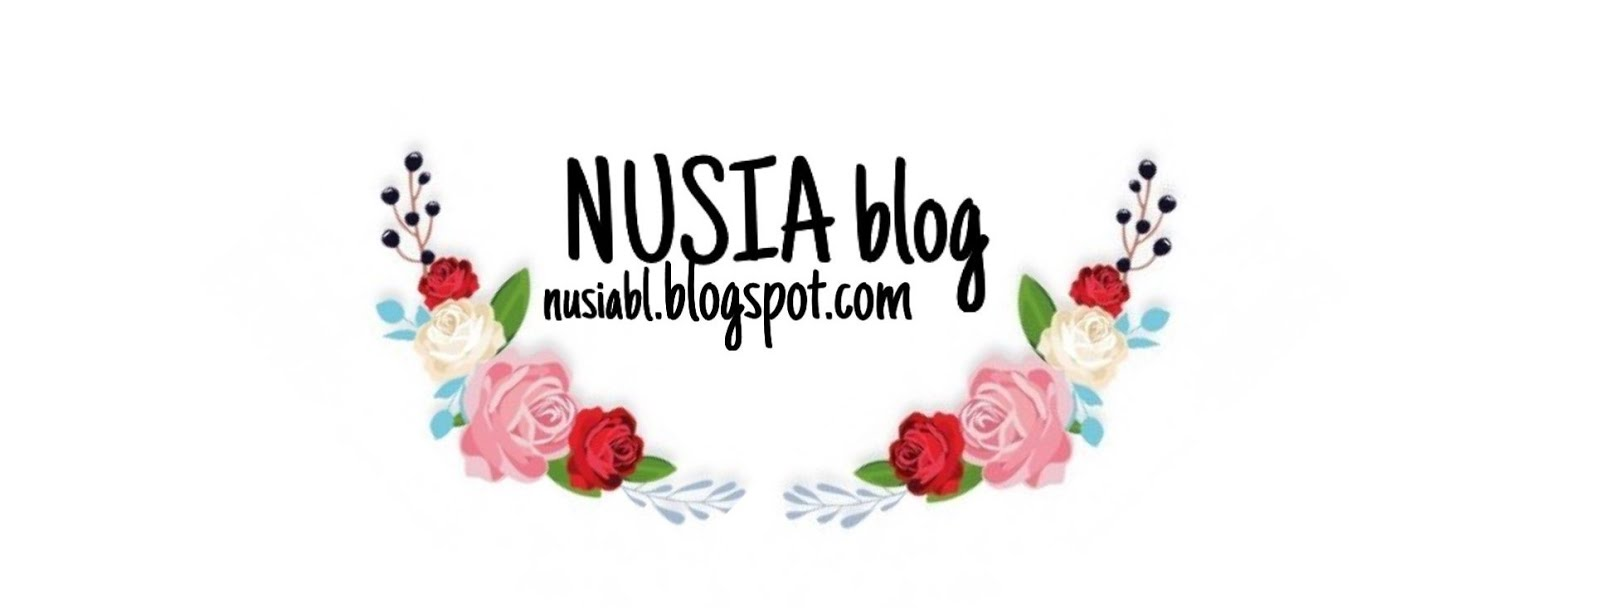 NUSIA blog